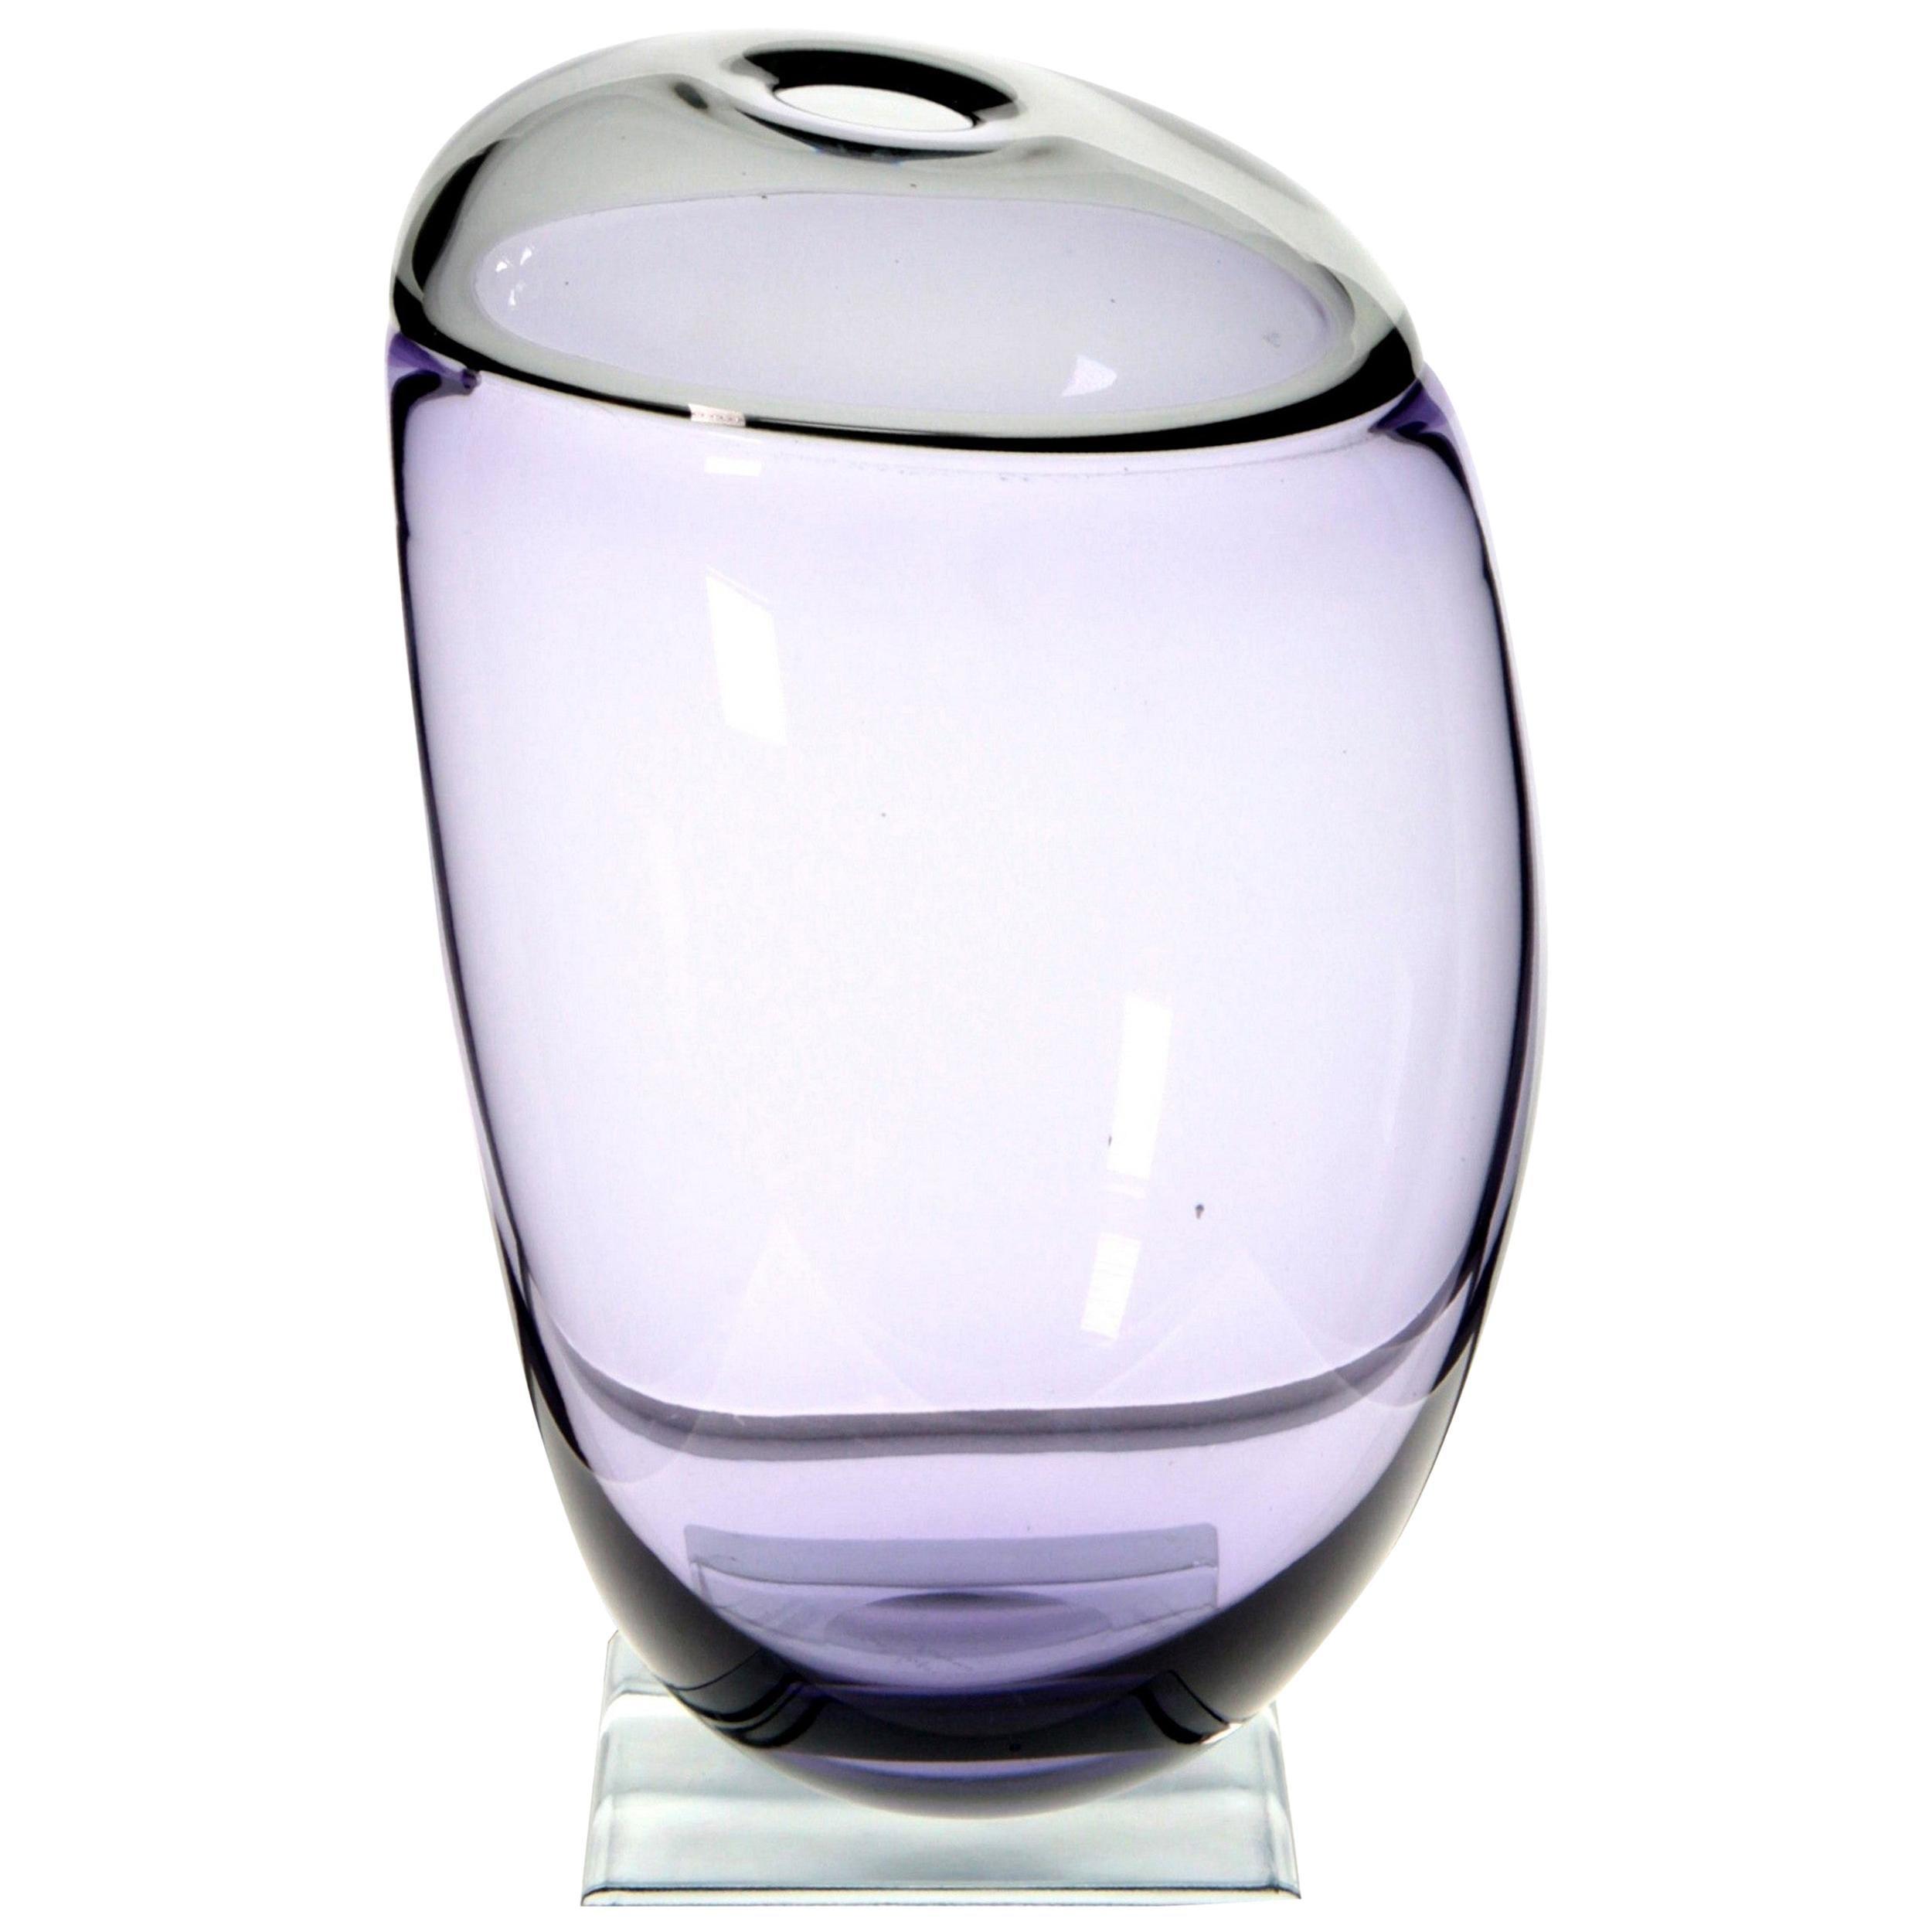 Paolo Crepax Asimmetrico Organic Vase Amethyst Gray Incalmo Murano Glass, Signed